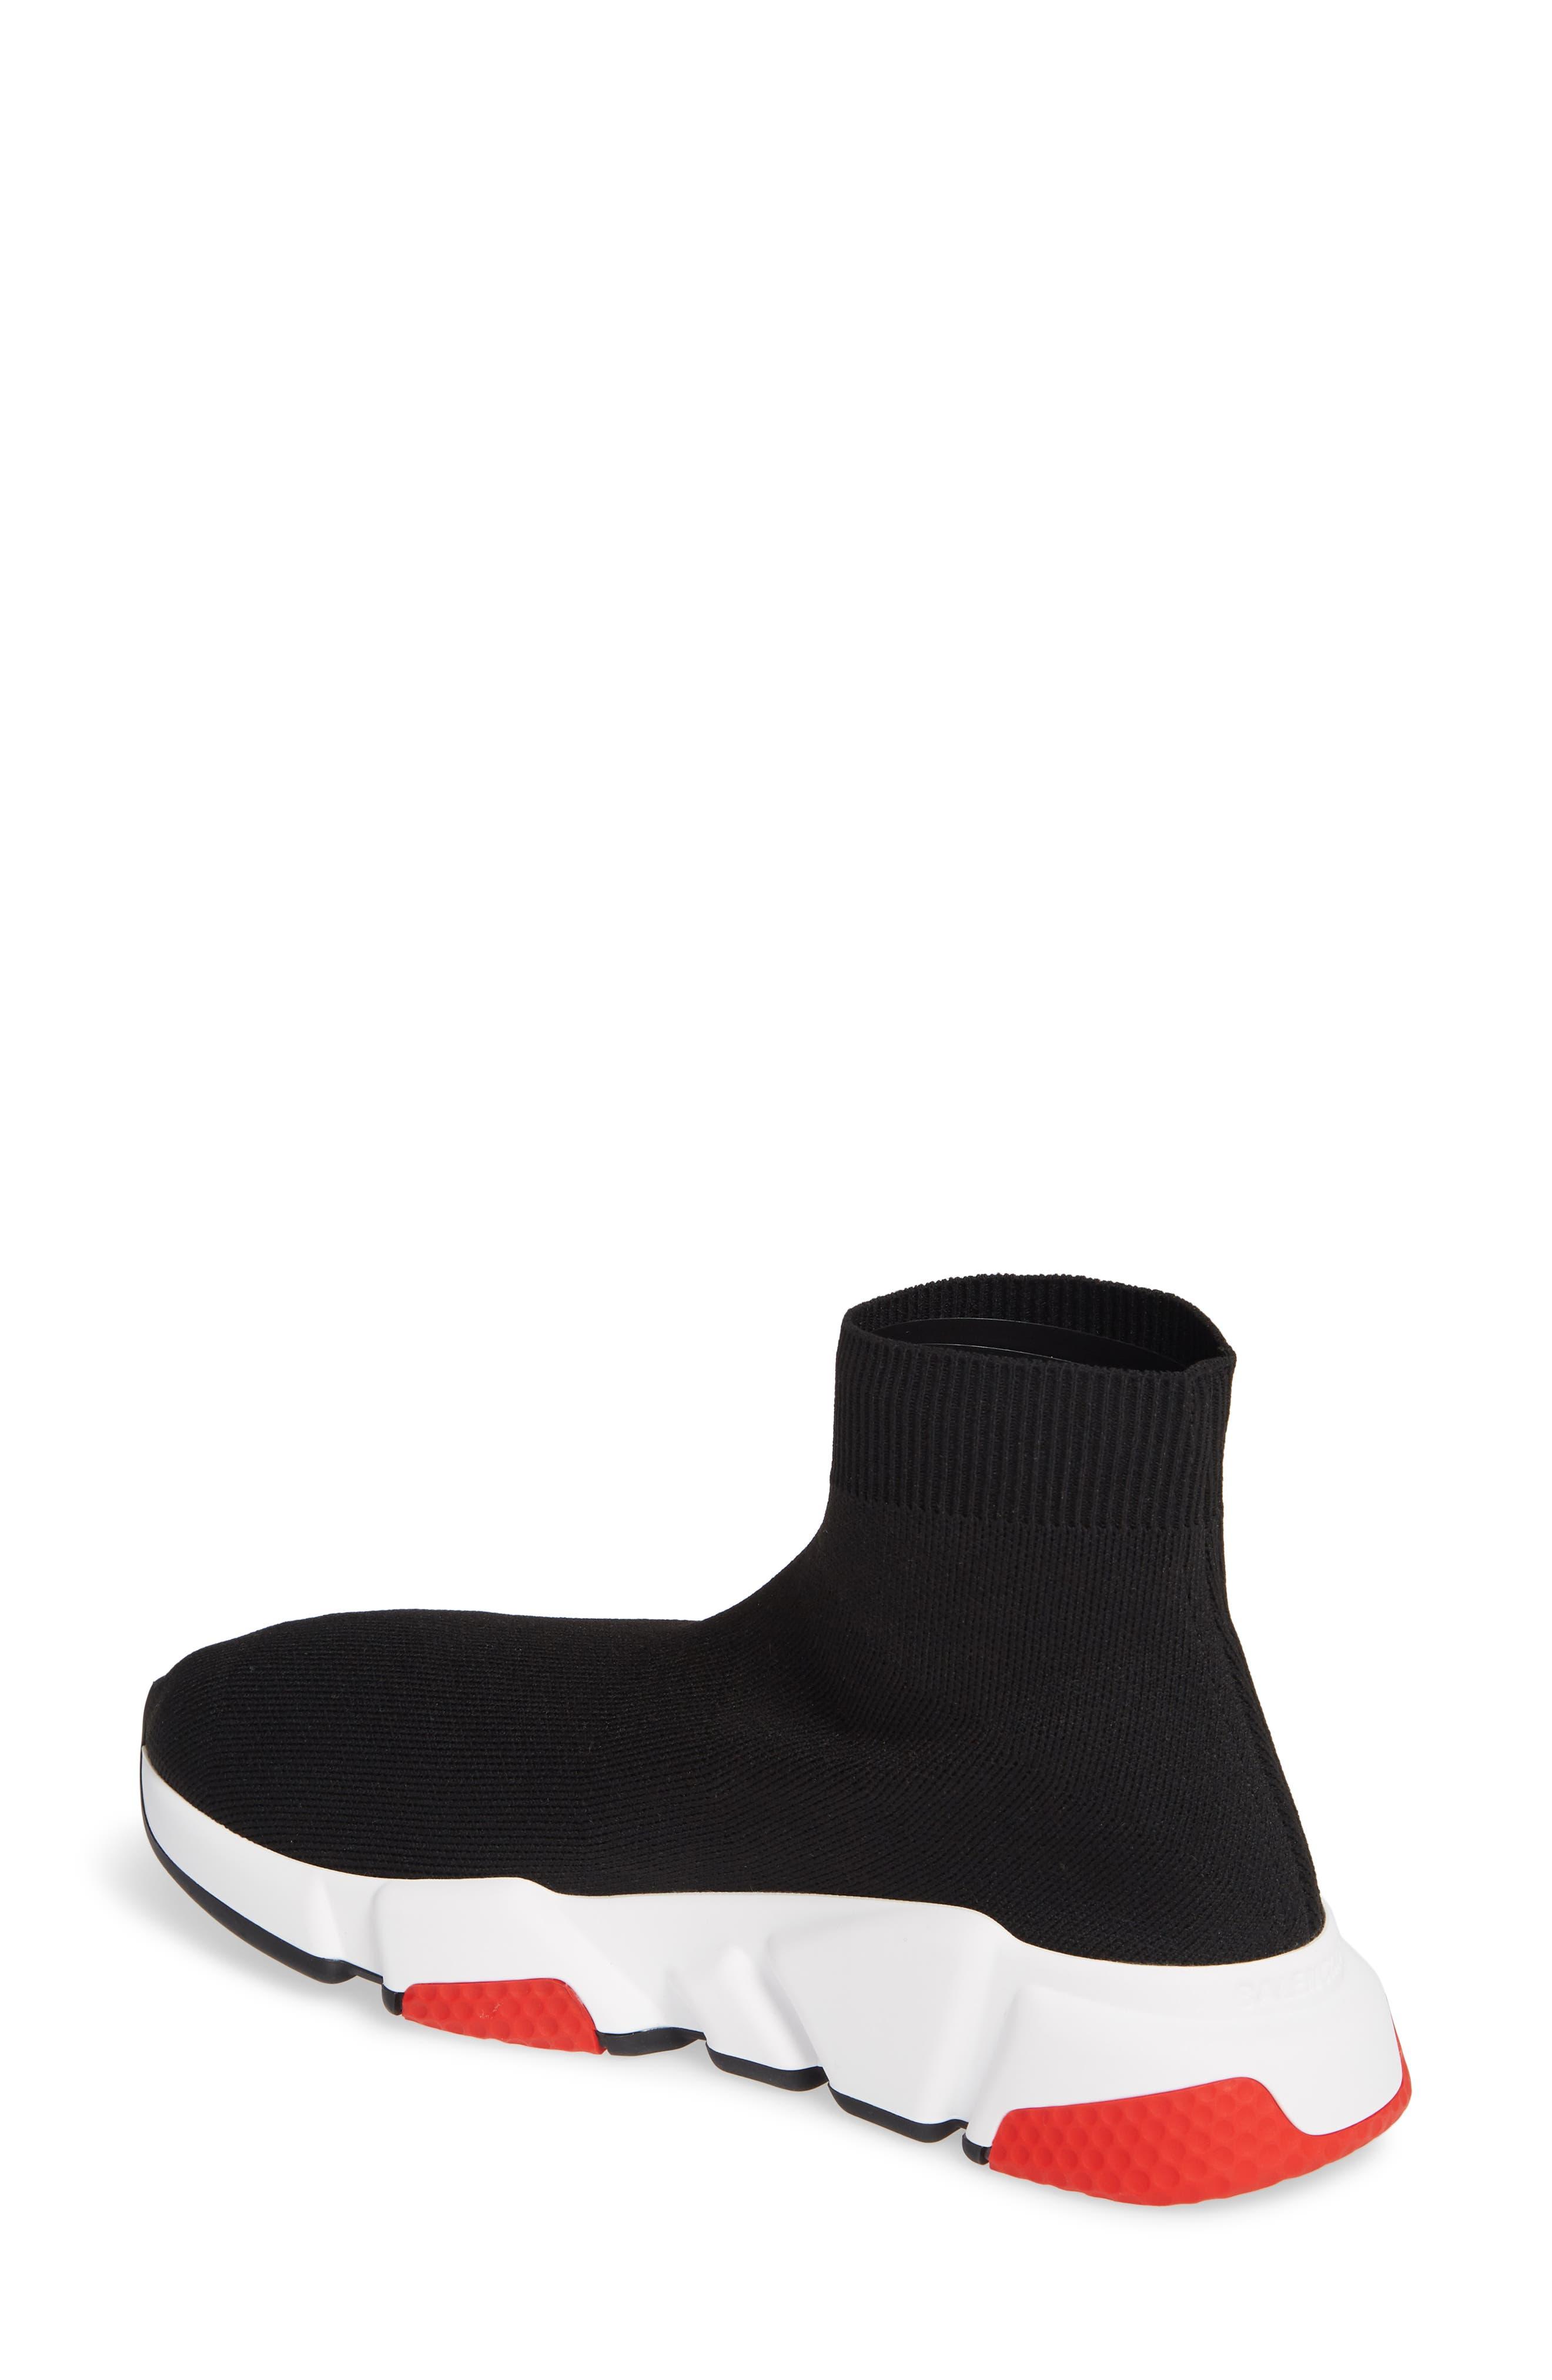 cda767563d5 Women s Balenciaga Shoes